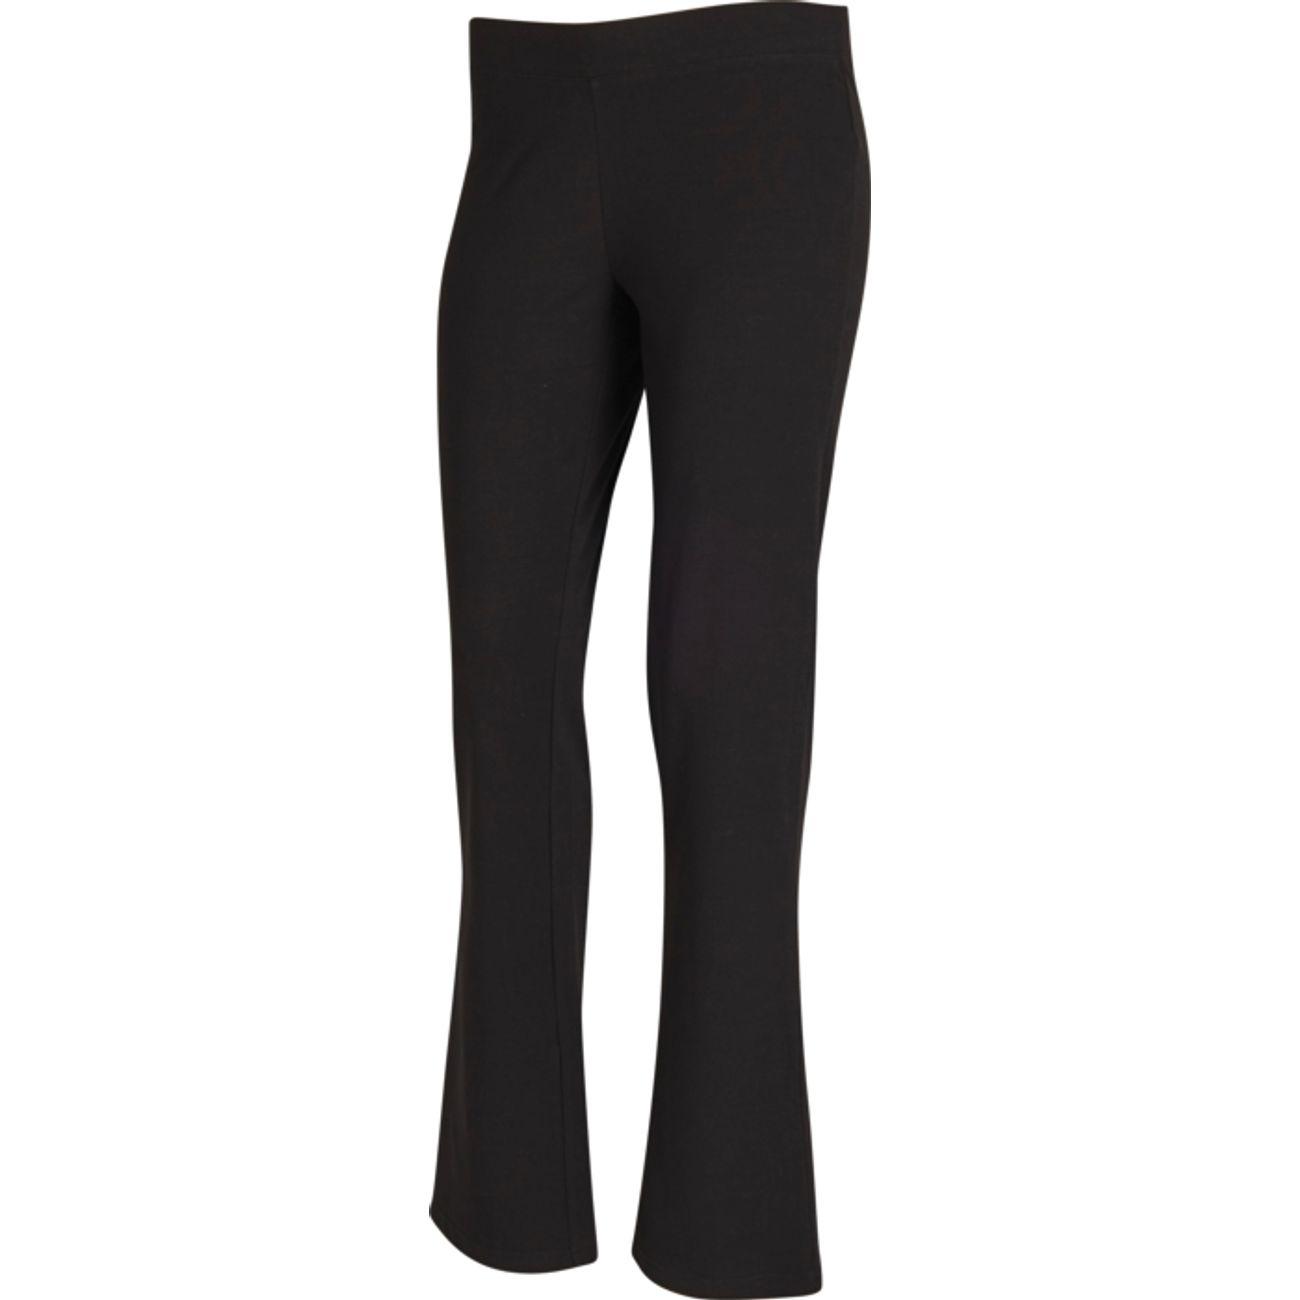 pantalon polyester adidas fitness femme